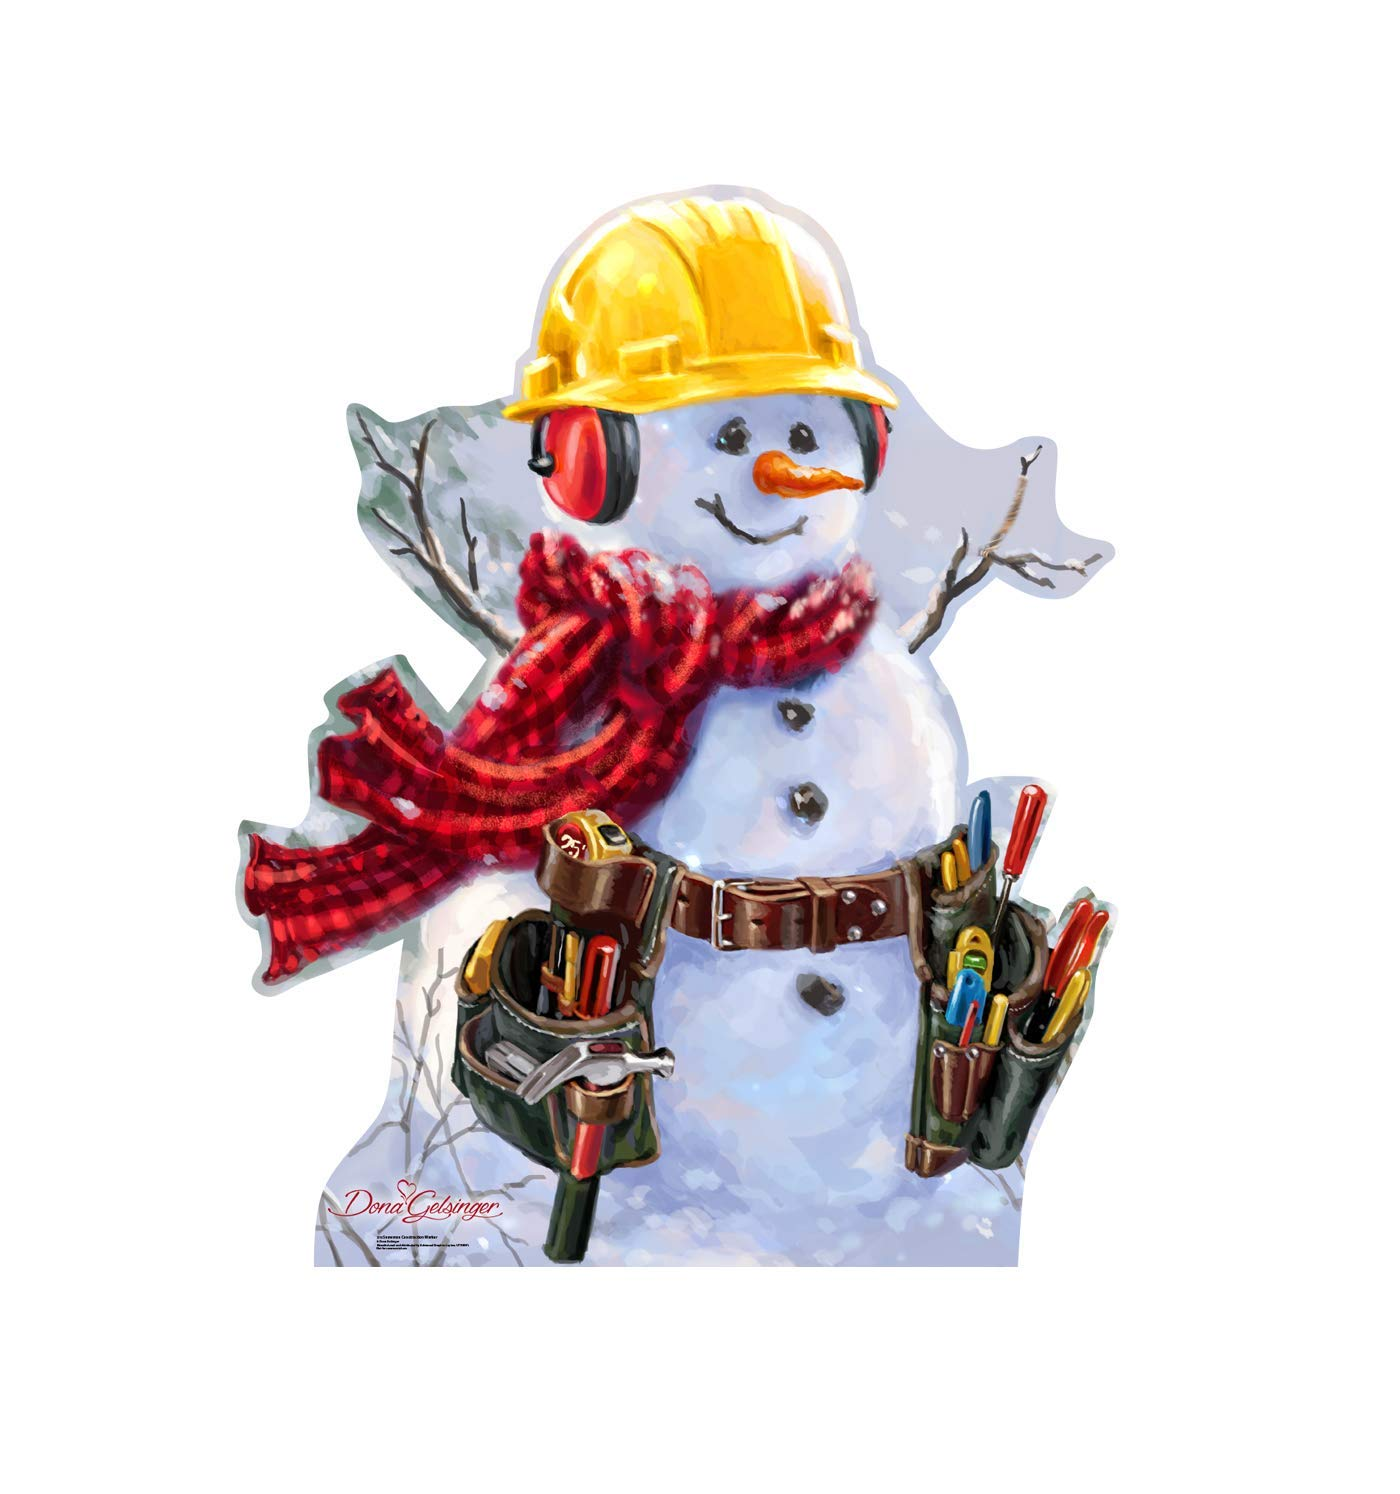 aded17a2eef4f Advanced Graphics Snowman Construction Worker Life Size Cardboard Cutout  Standup - Dona Gelsinger Art